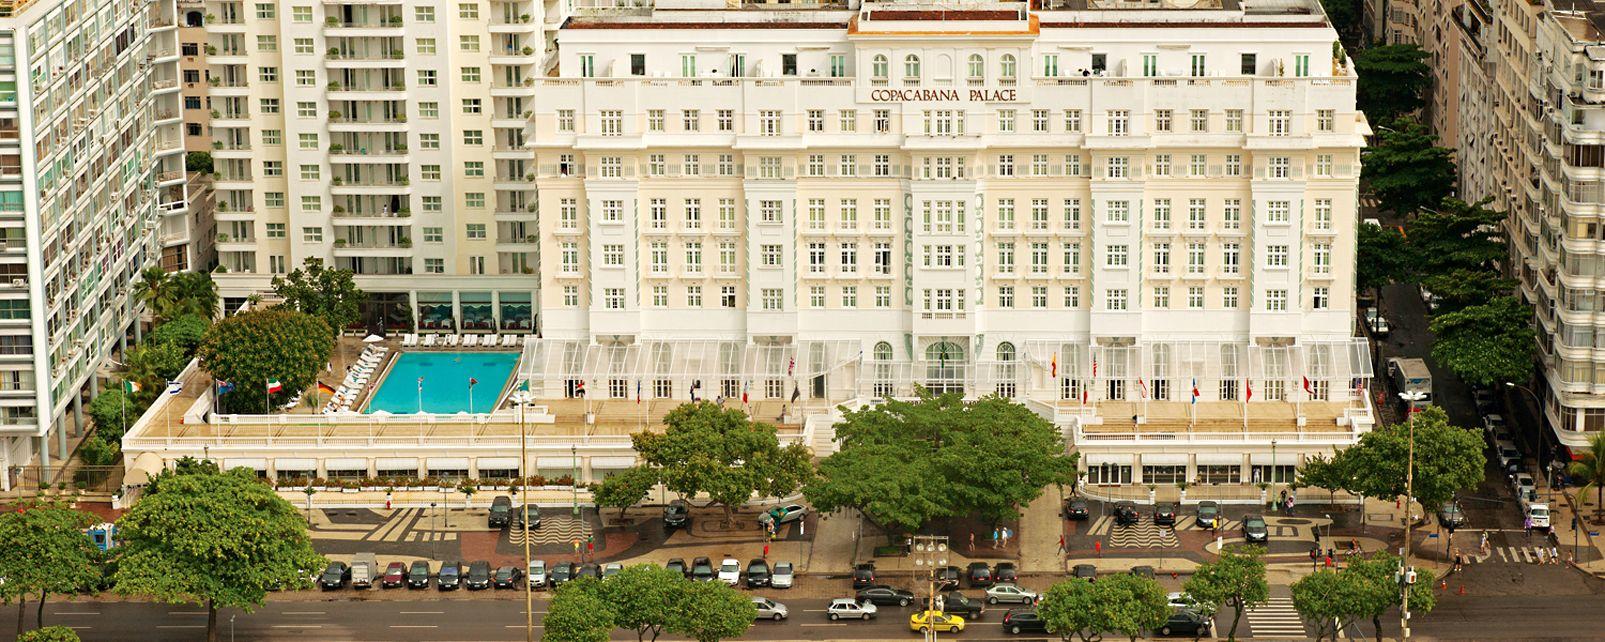 Hôtel Belmond Copacabana Palace